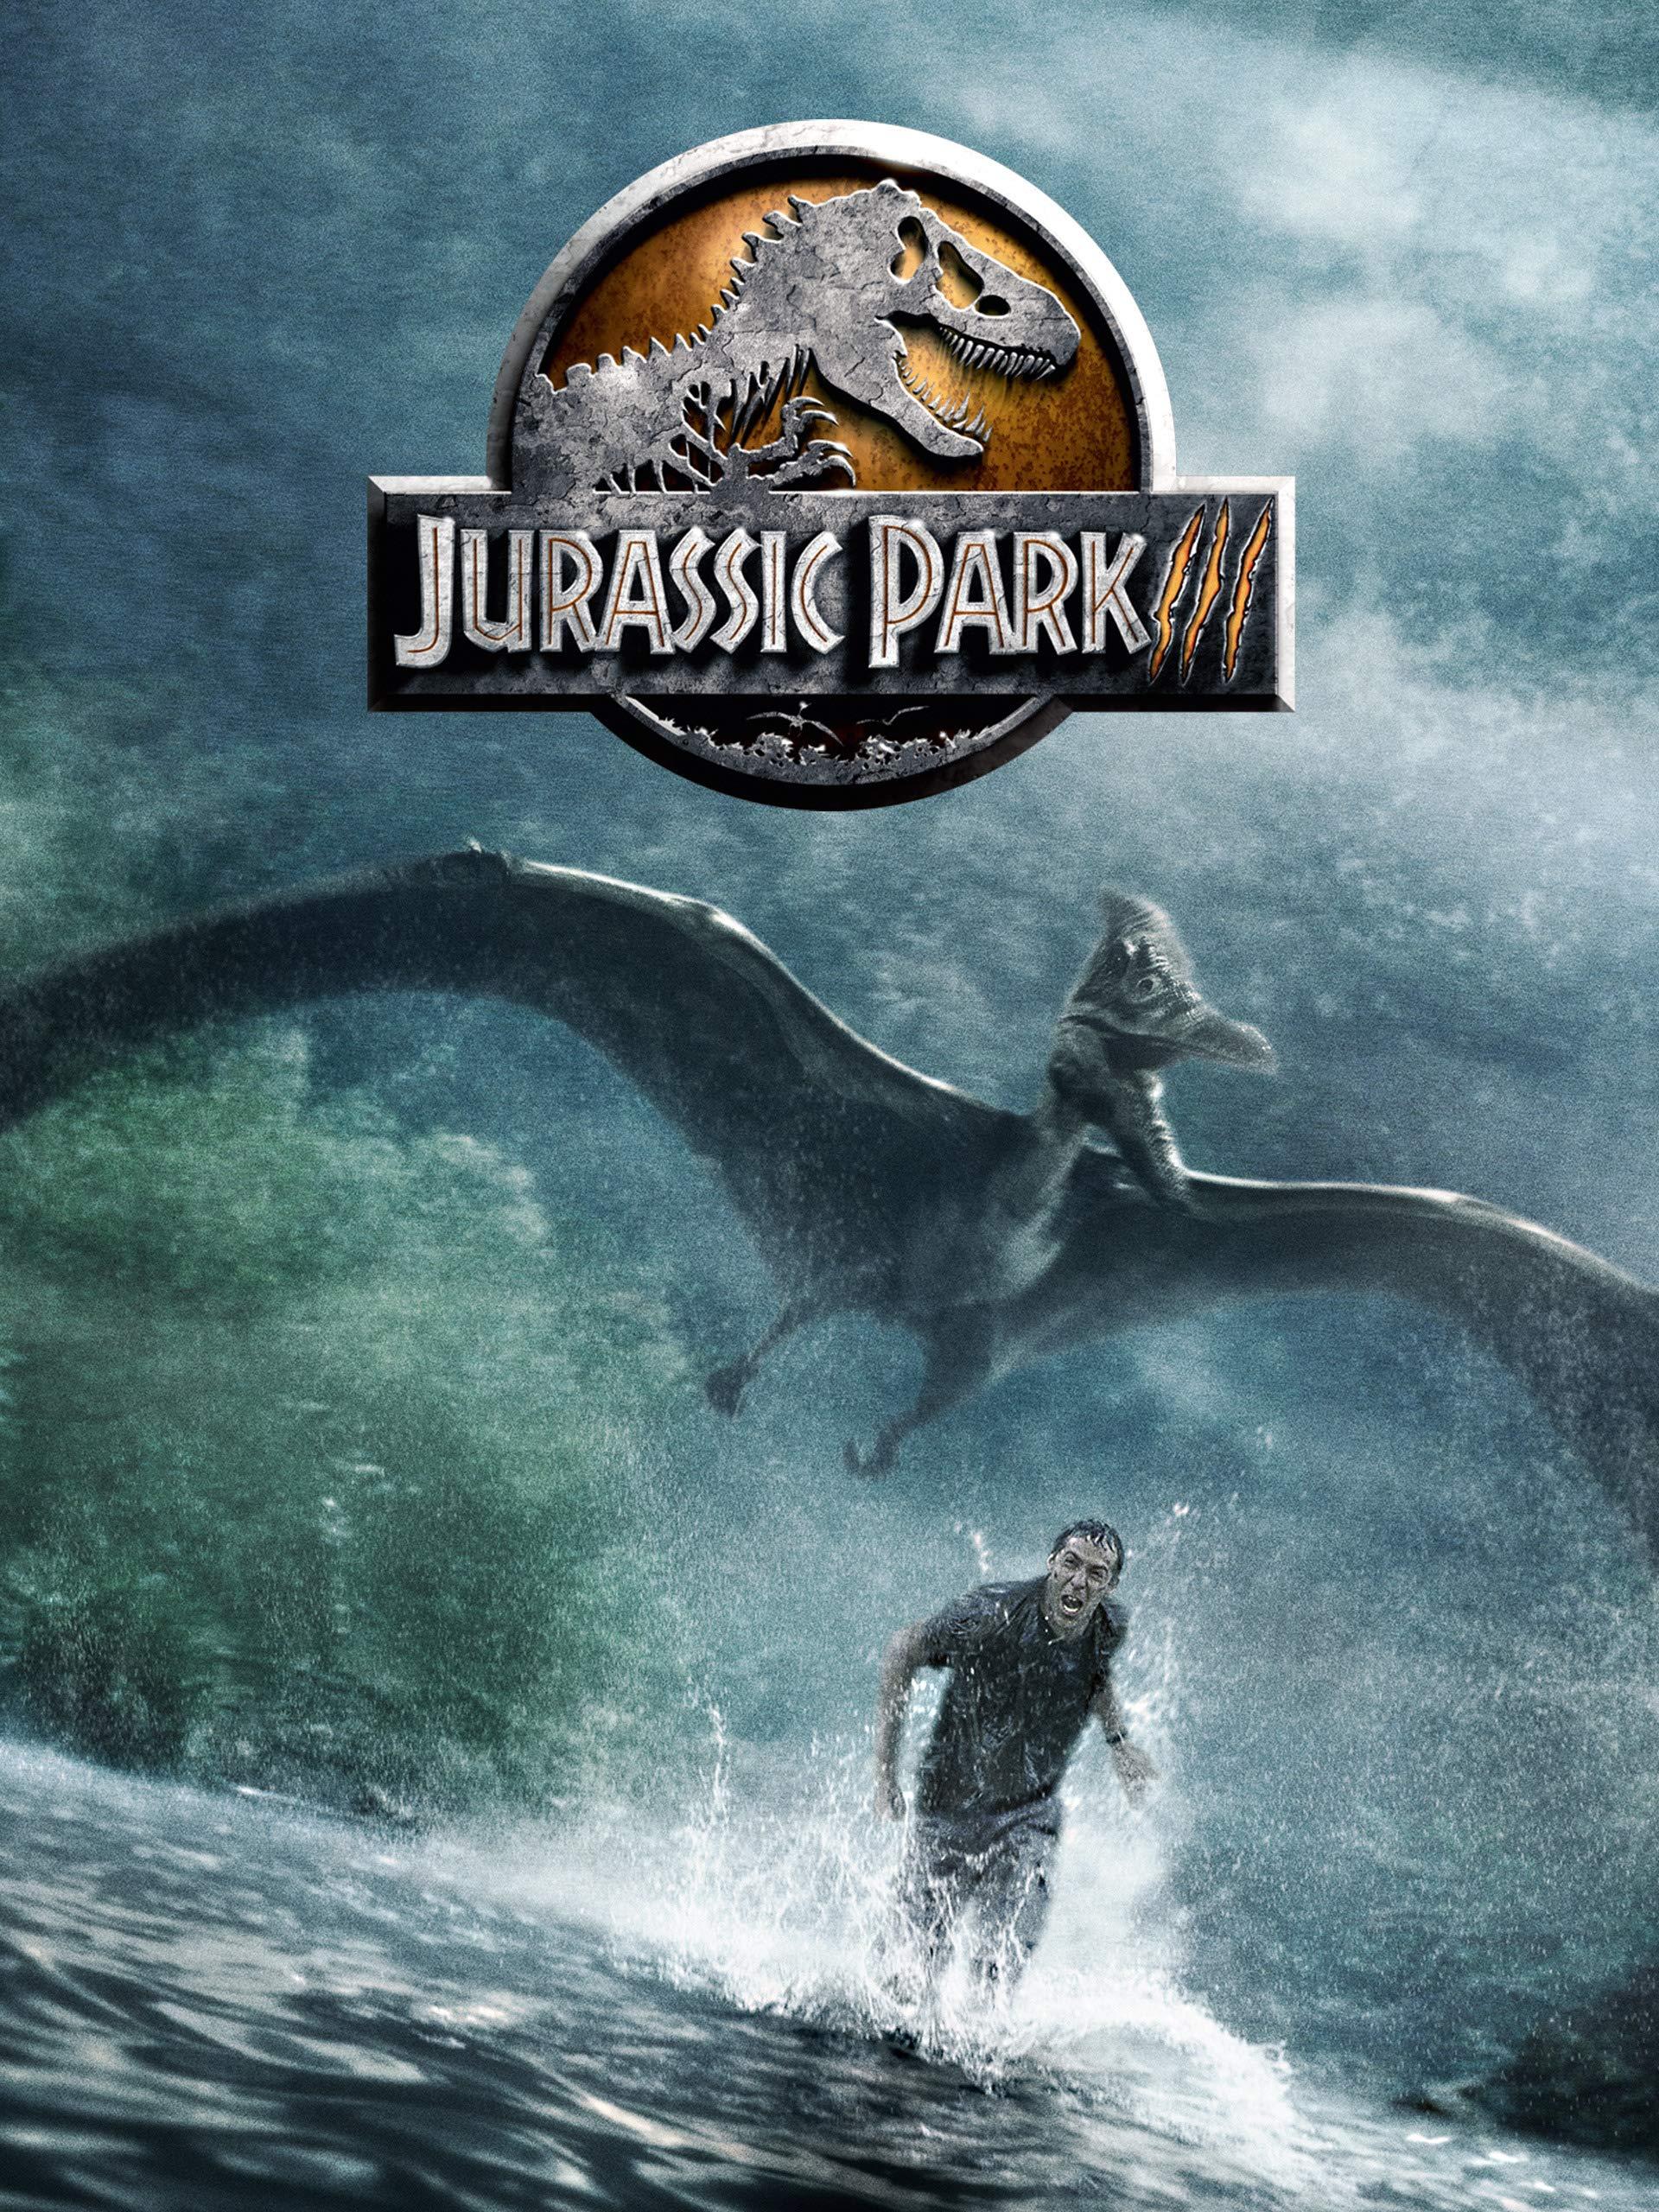 Jurassic Park III (4K UHD) on Amazon Prime Video UK